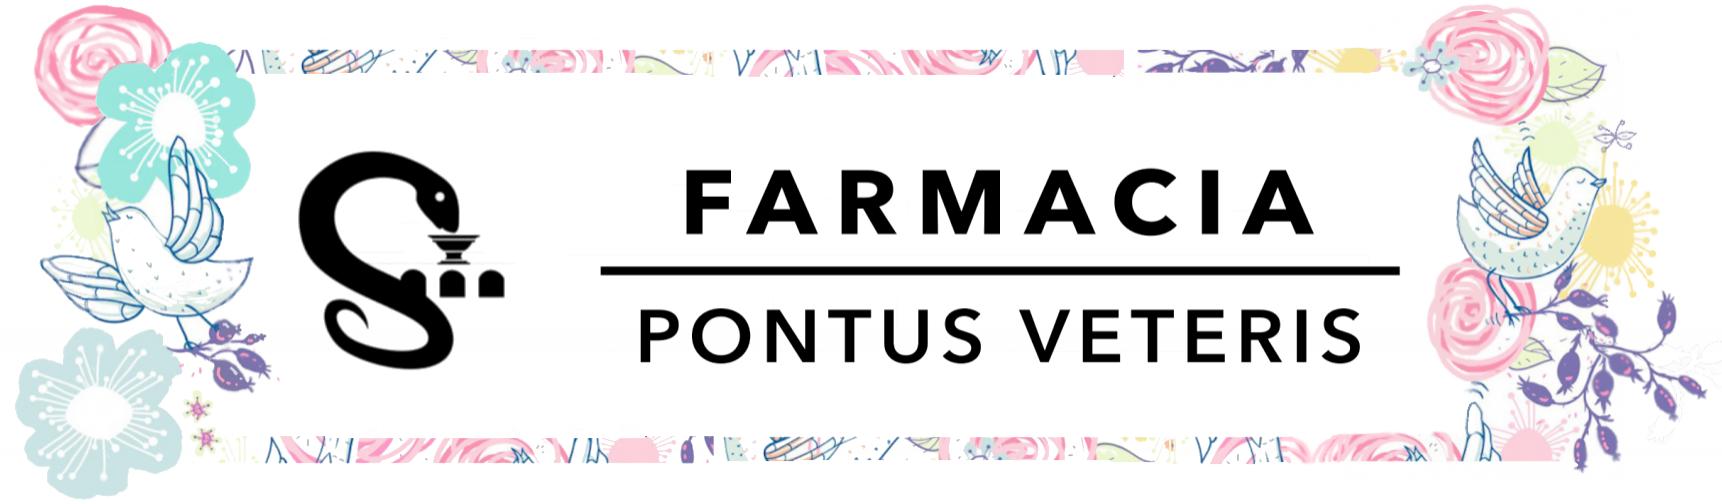 Farmacia Pontus Veteris Online